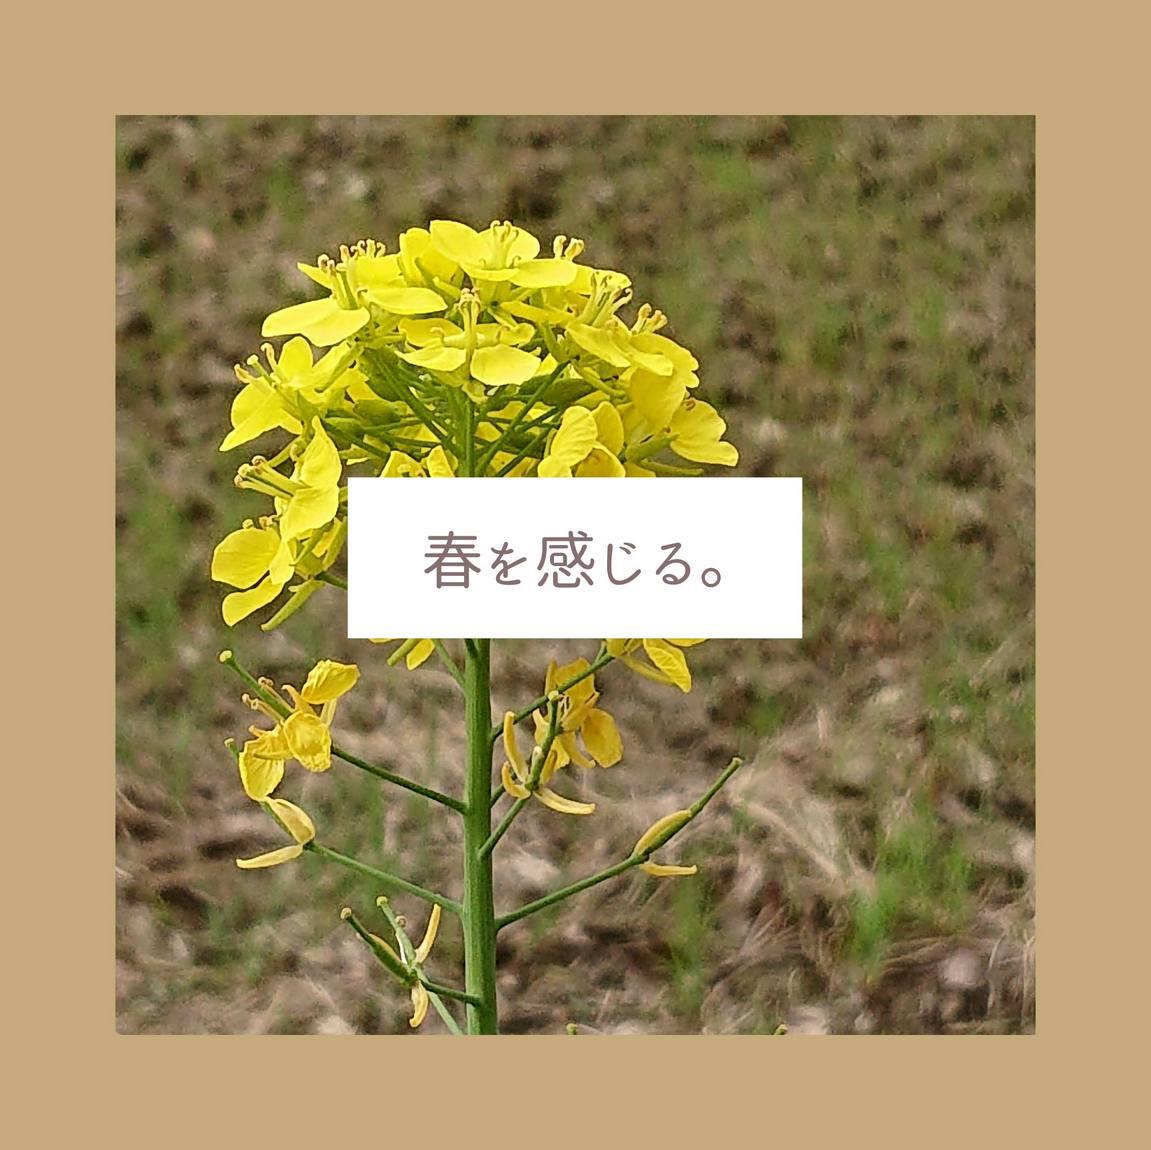 f:id:ooyuyuoo:20210406211501j:plain